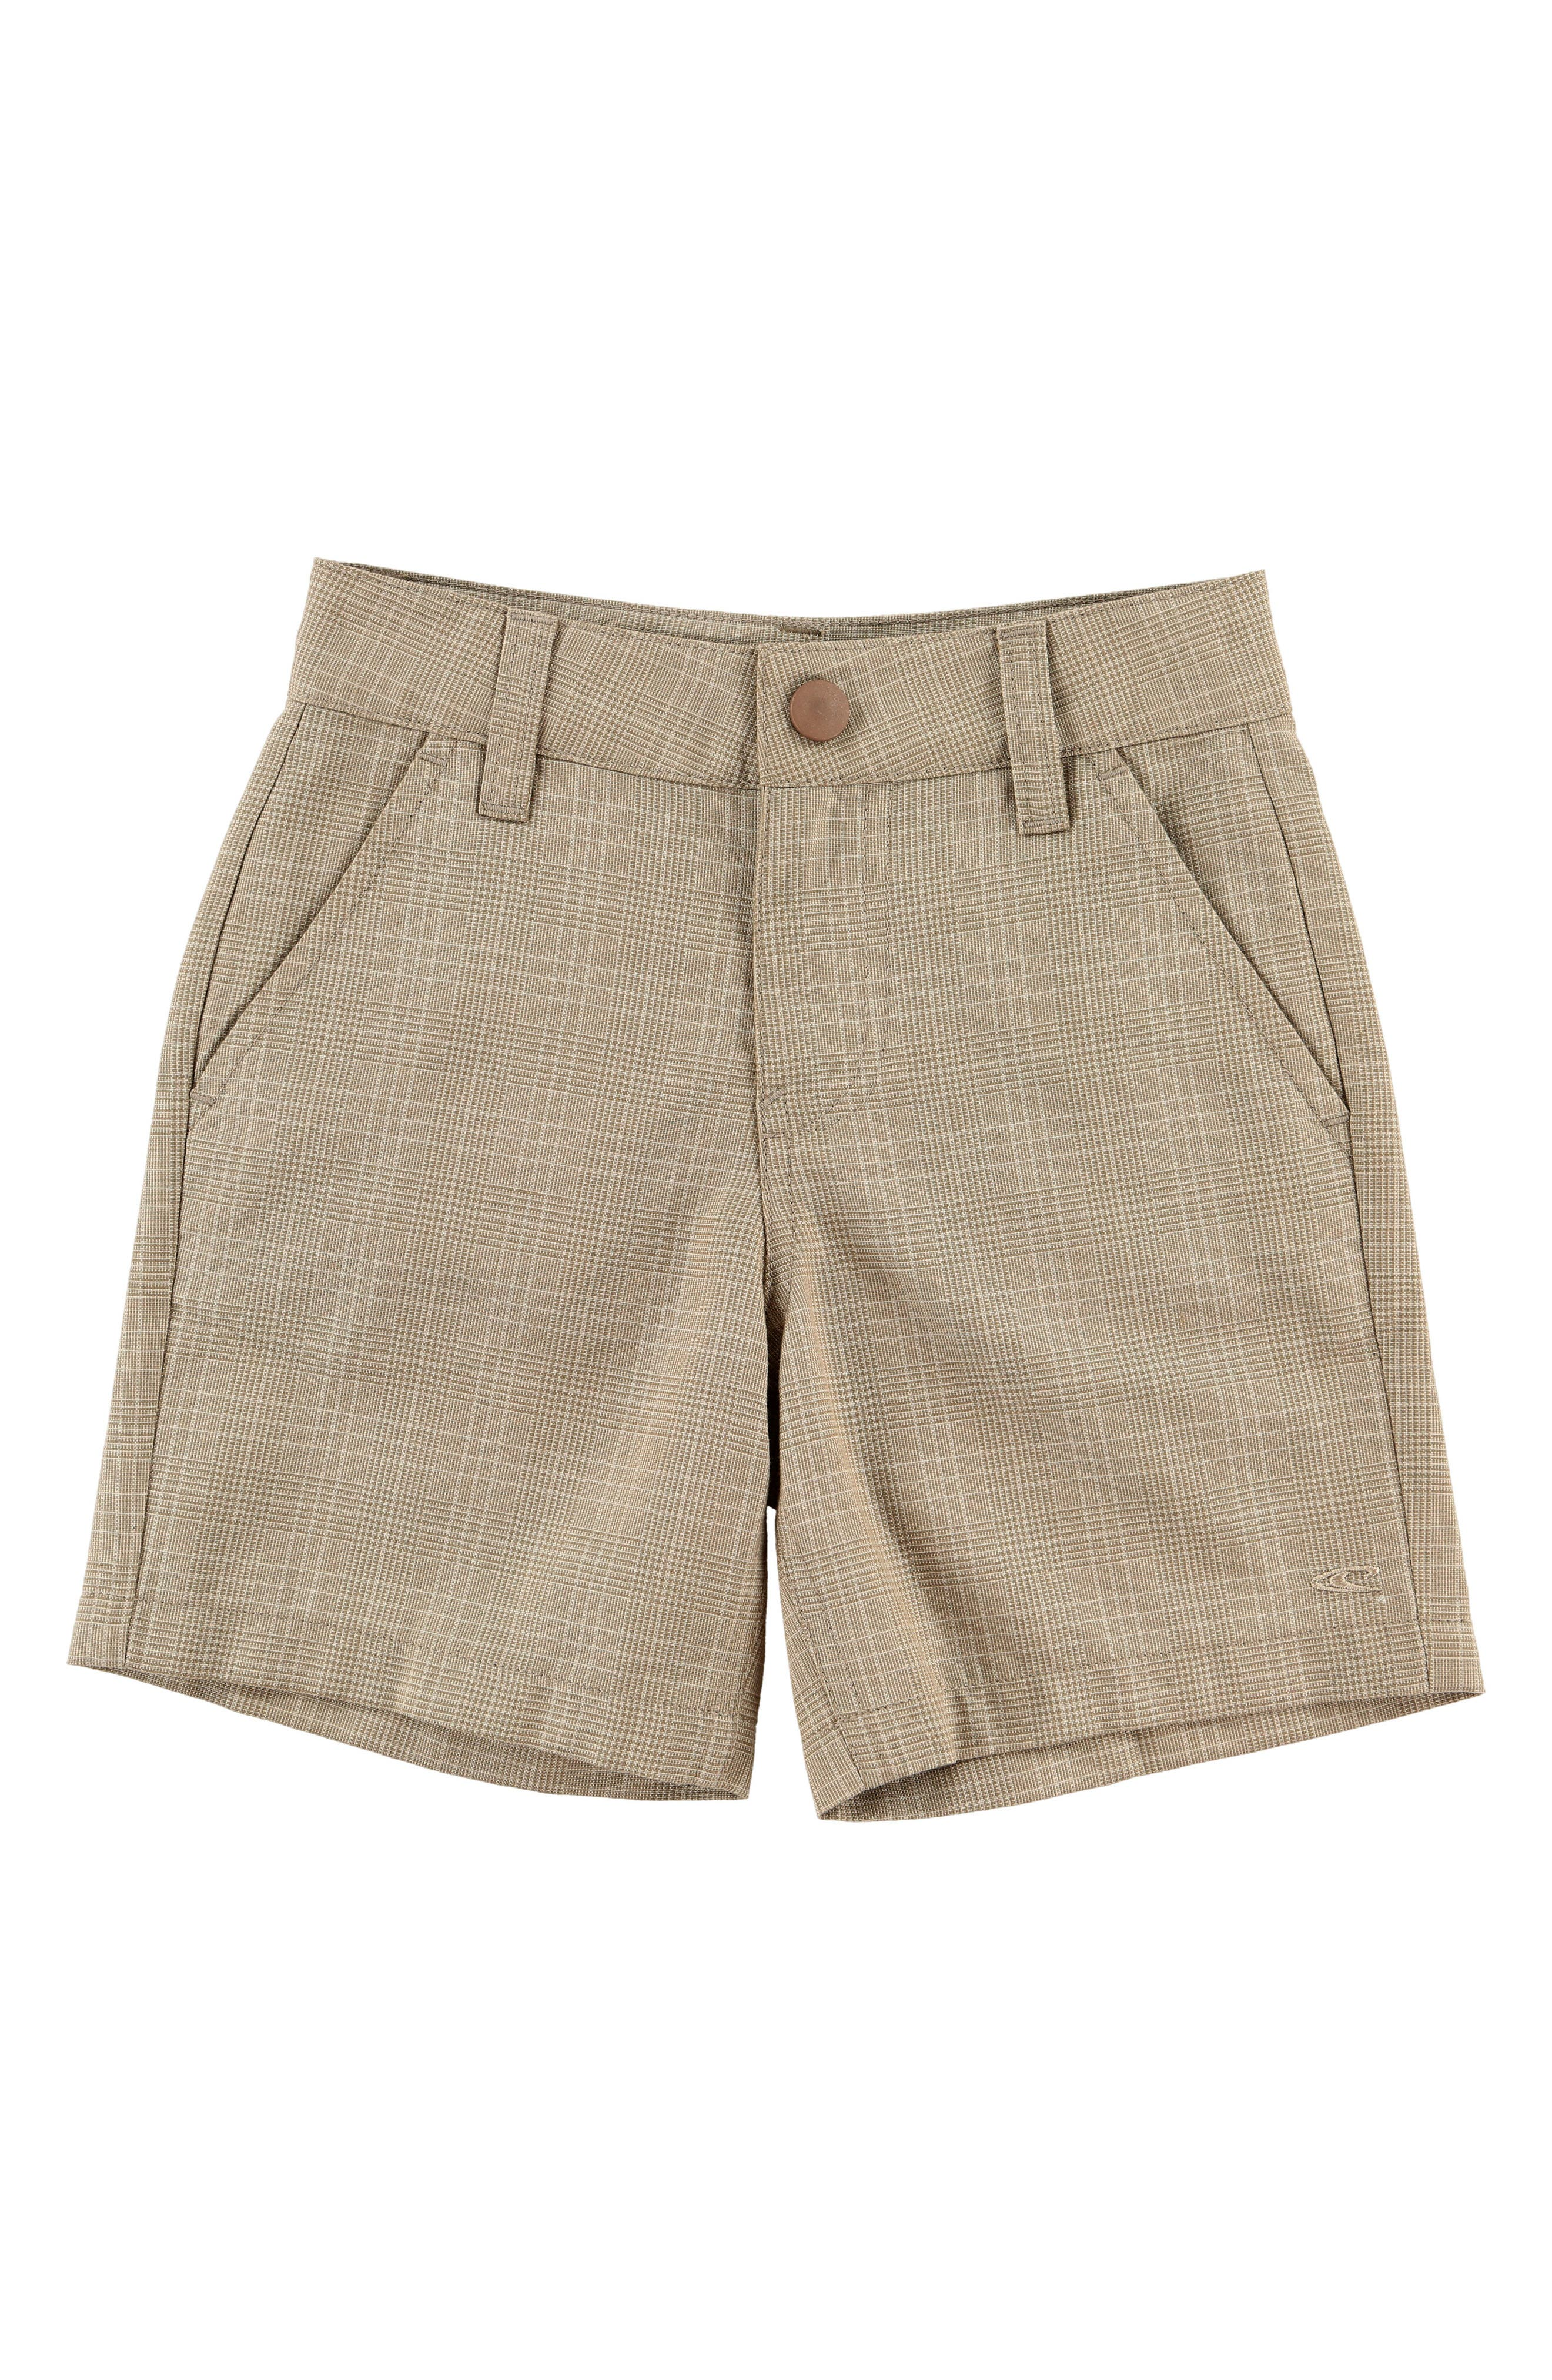 Alternate Image 1 Selected - O'Neill Delta Plaid Shorts (Toddler Boys)